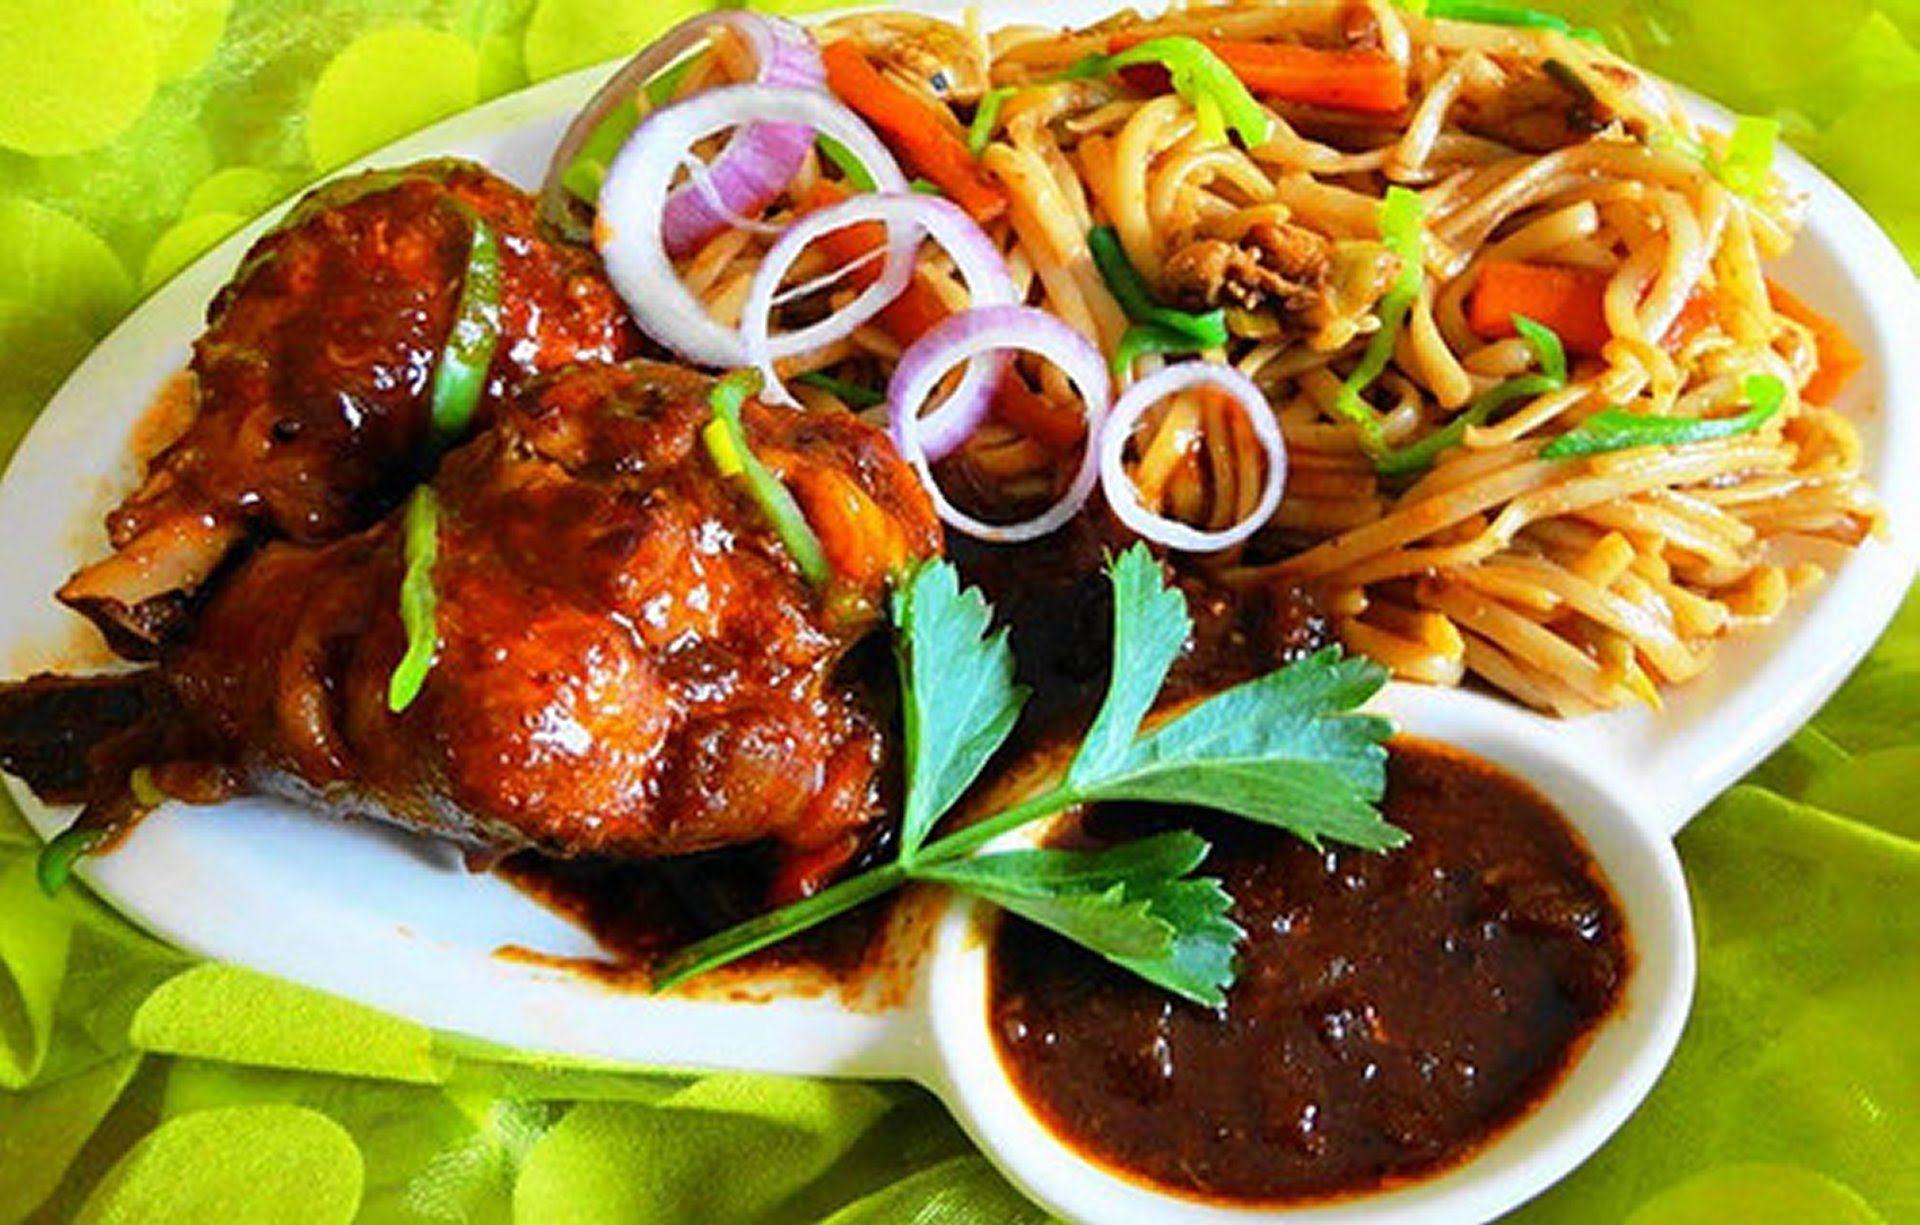 Surinam food noodles with chicken recipe recipes youtube surinam food noodles with chicken recipe forumfinder Images